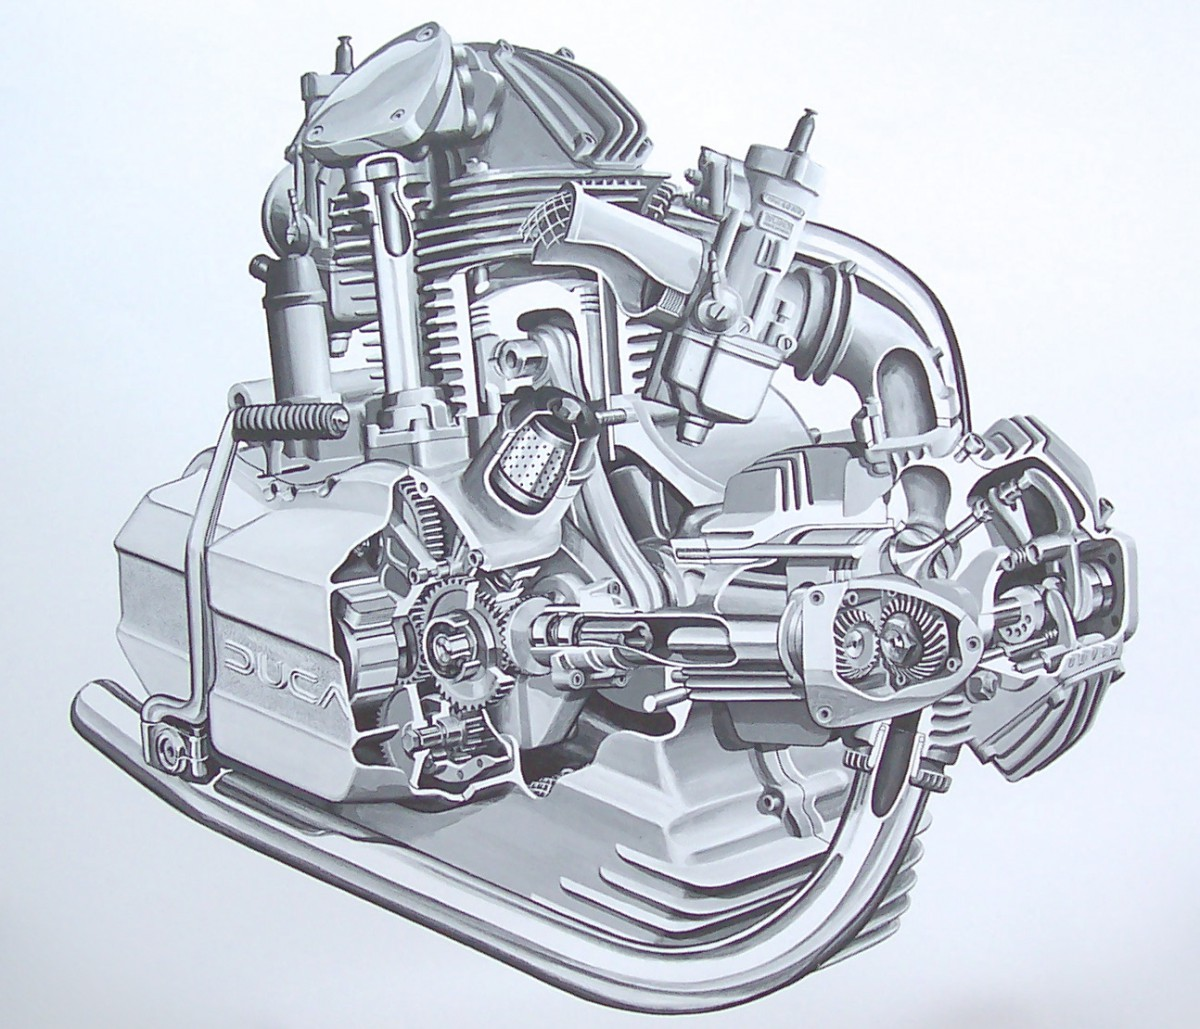 1200x1029 Engine Drawings Bambrick Studio